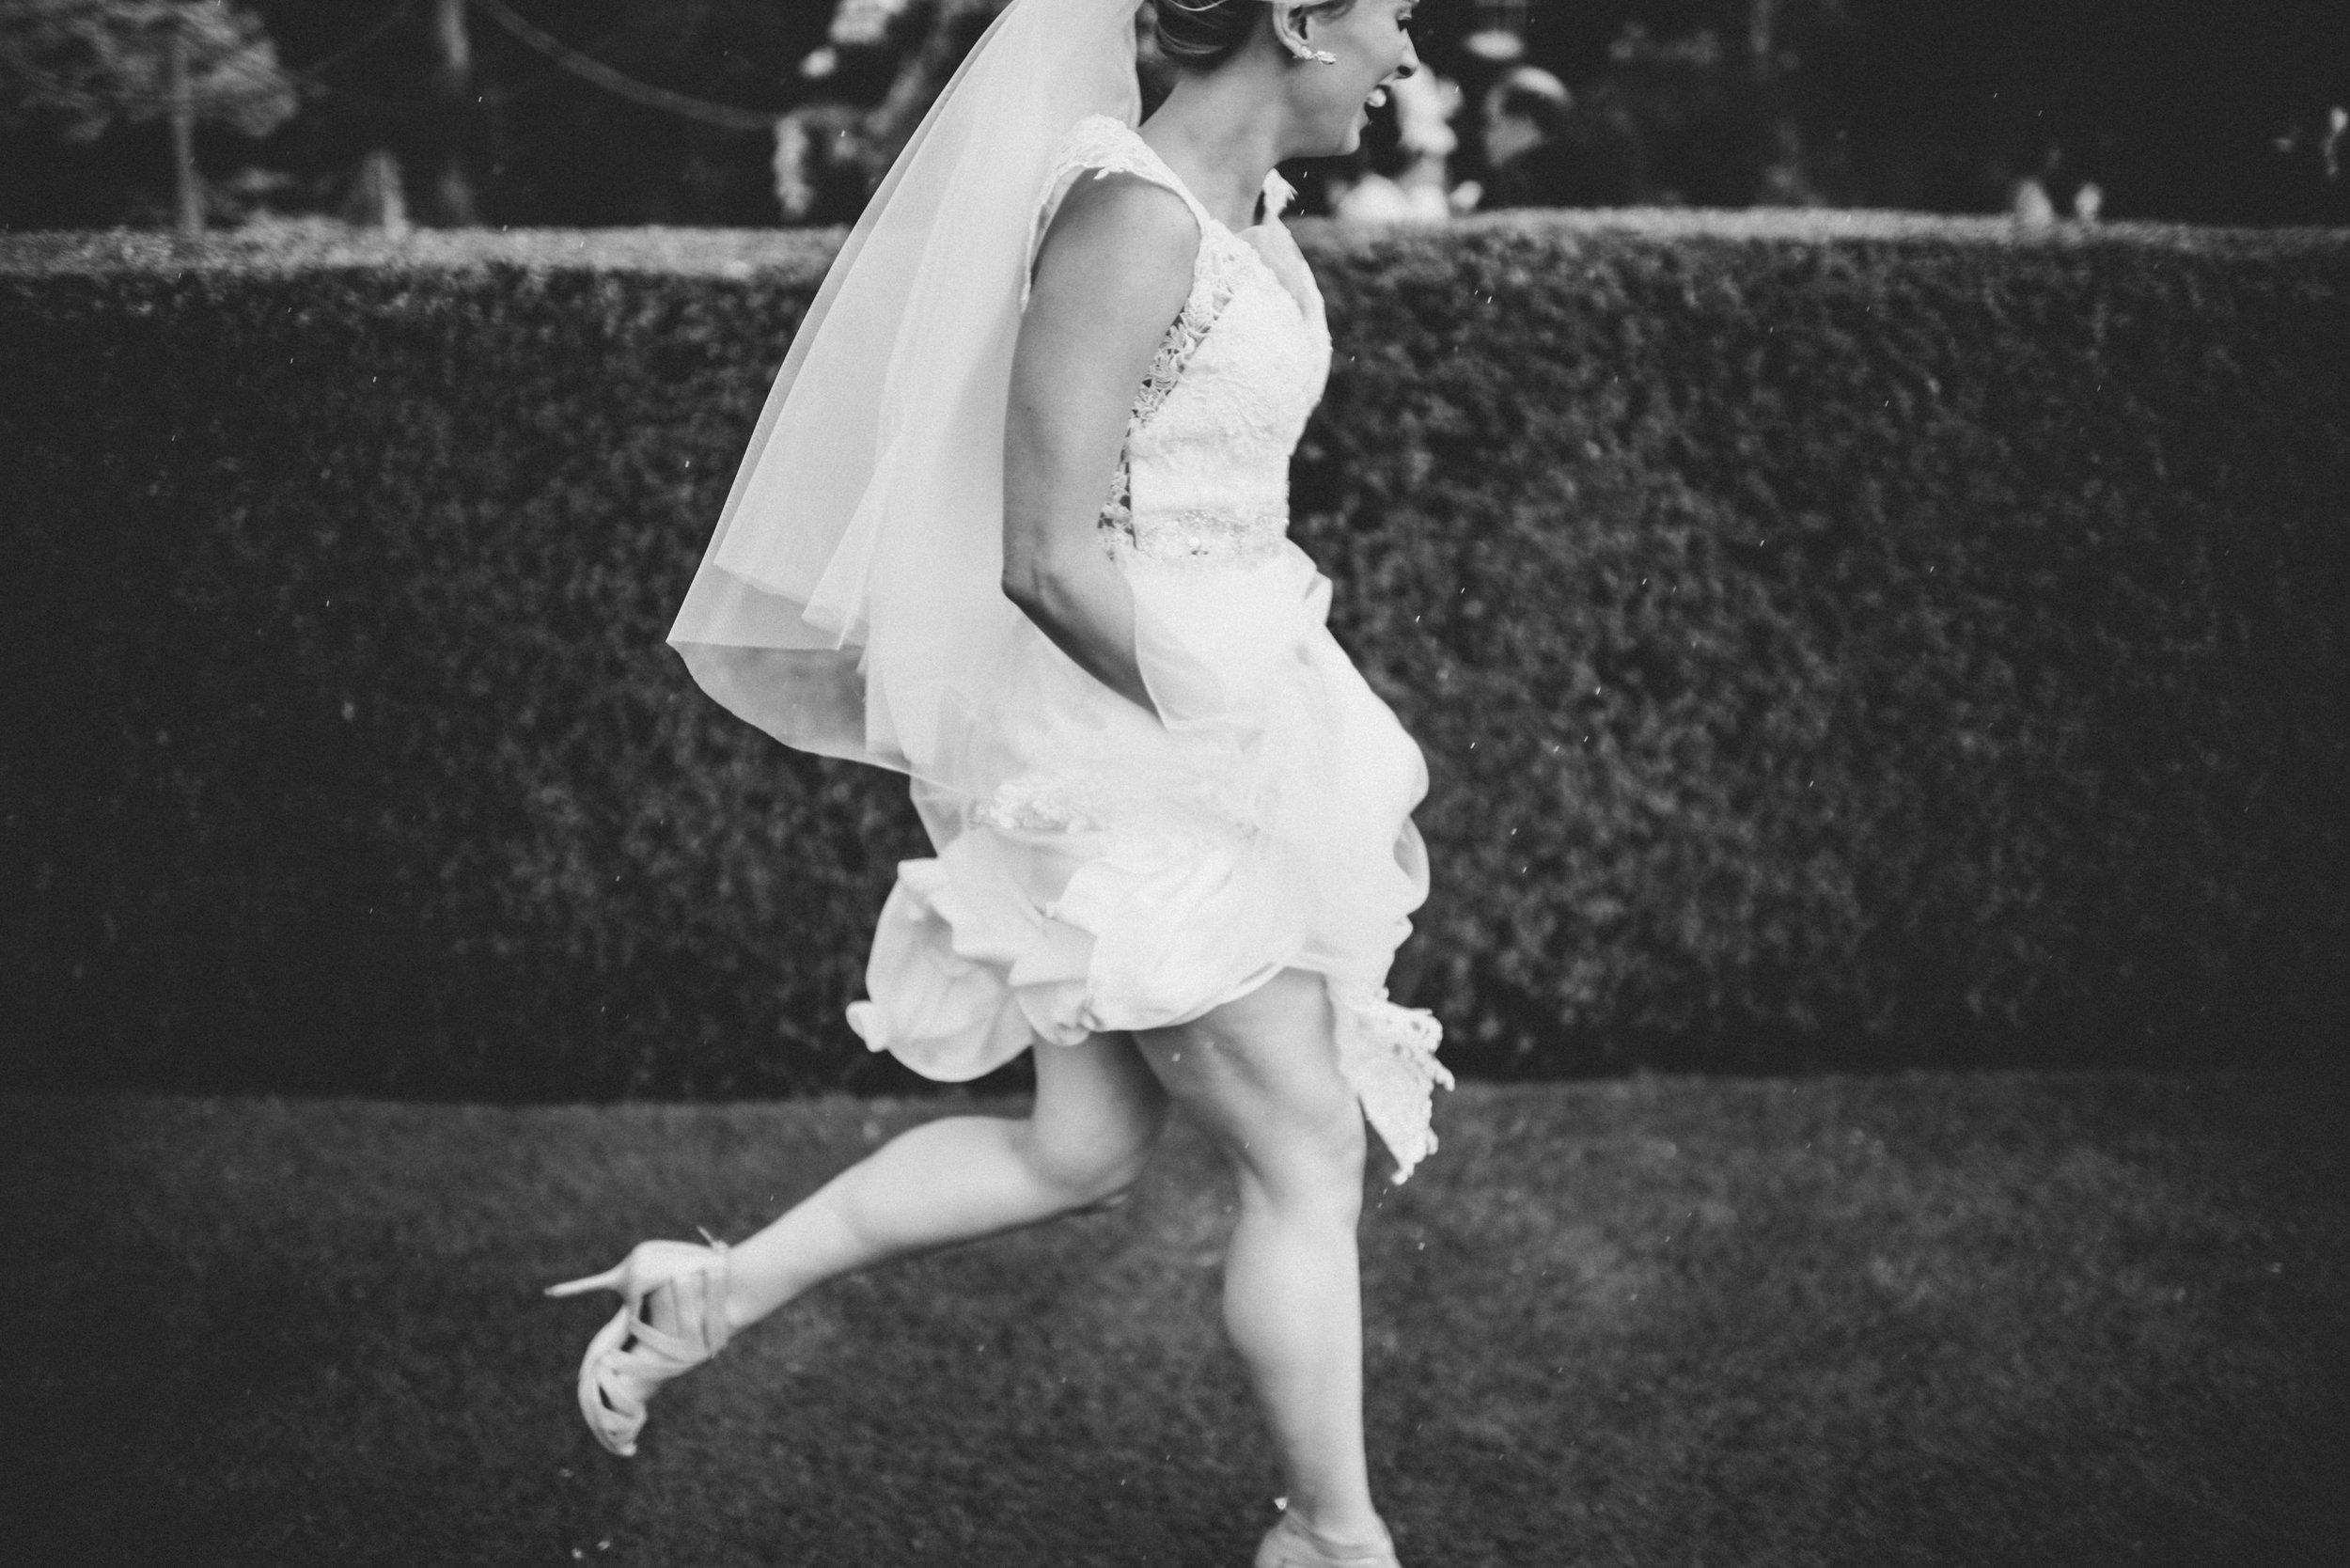 0021-alternative-wedding-portrait-family-kids-photographer-glasgow-scotland.JPG